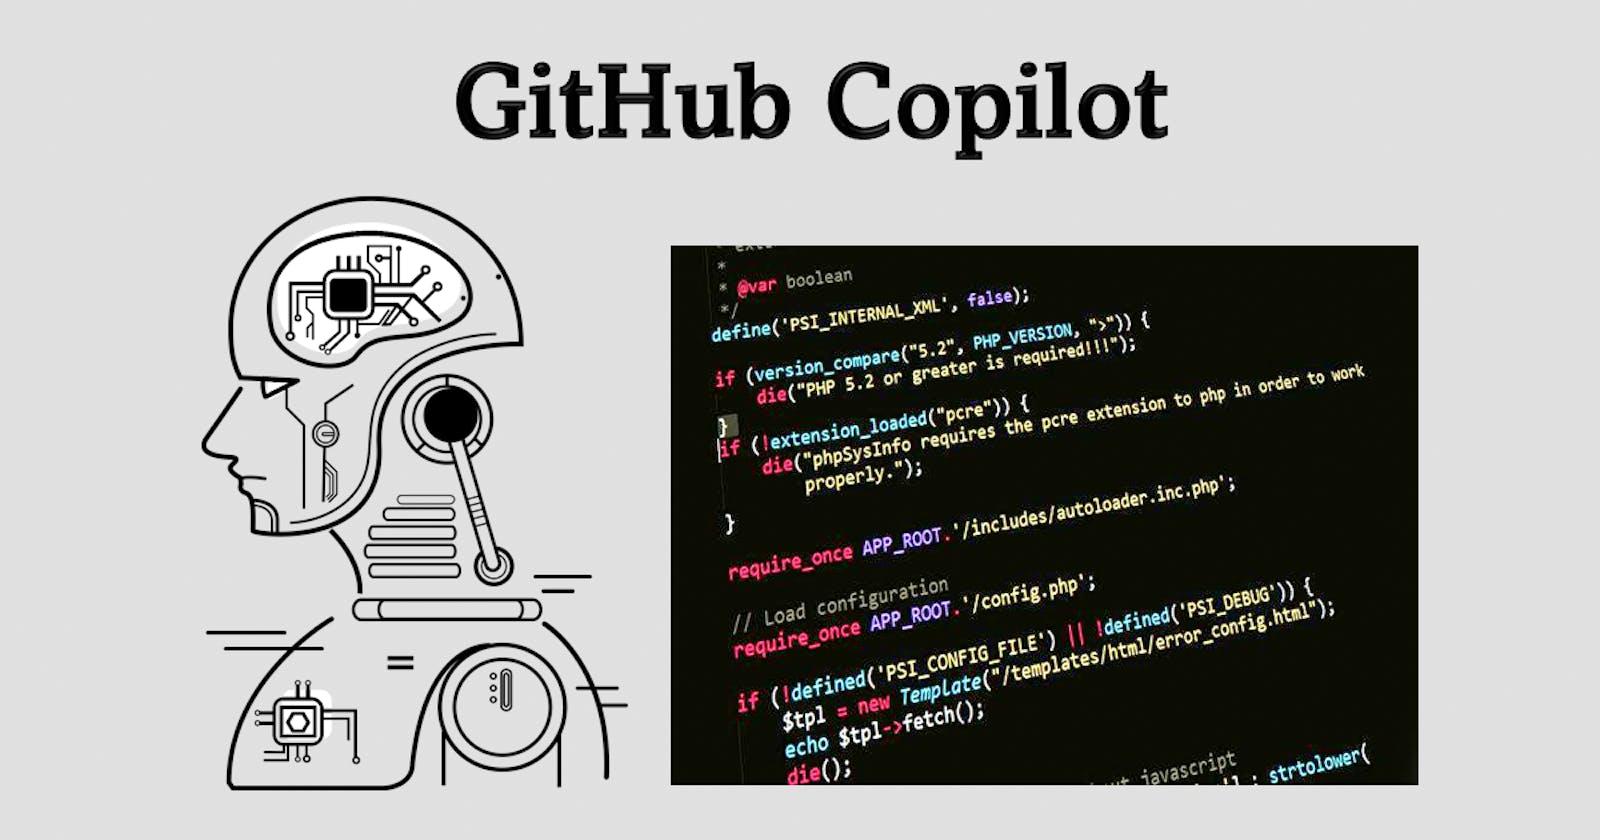 GitHub Copilot - Future of Programming?